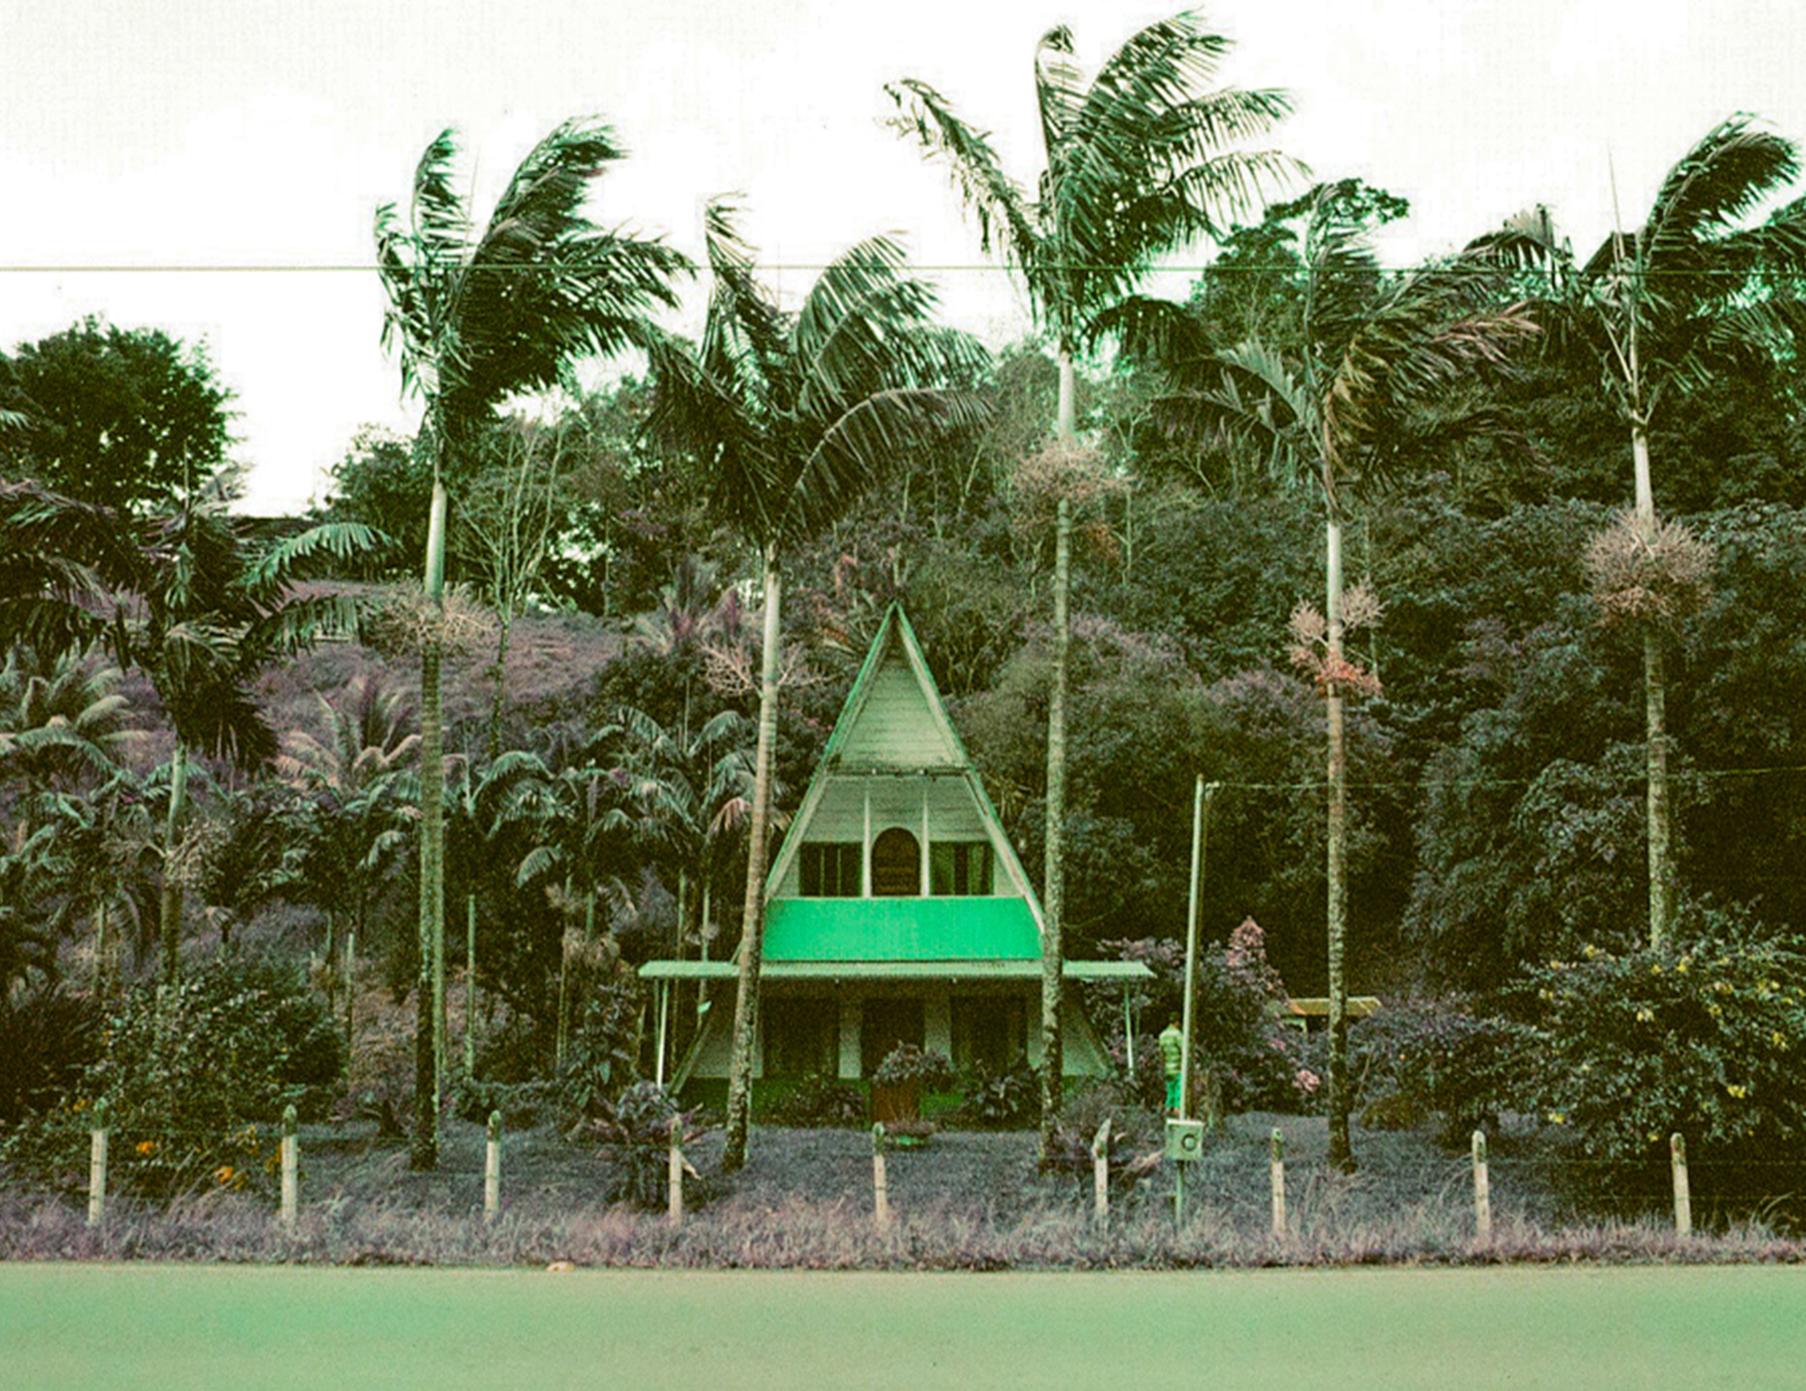 Costa Rica Hut 35mm.jpg